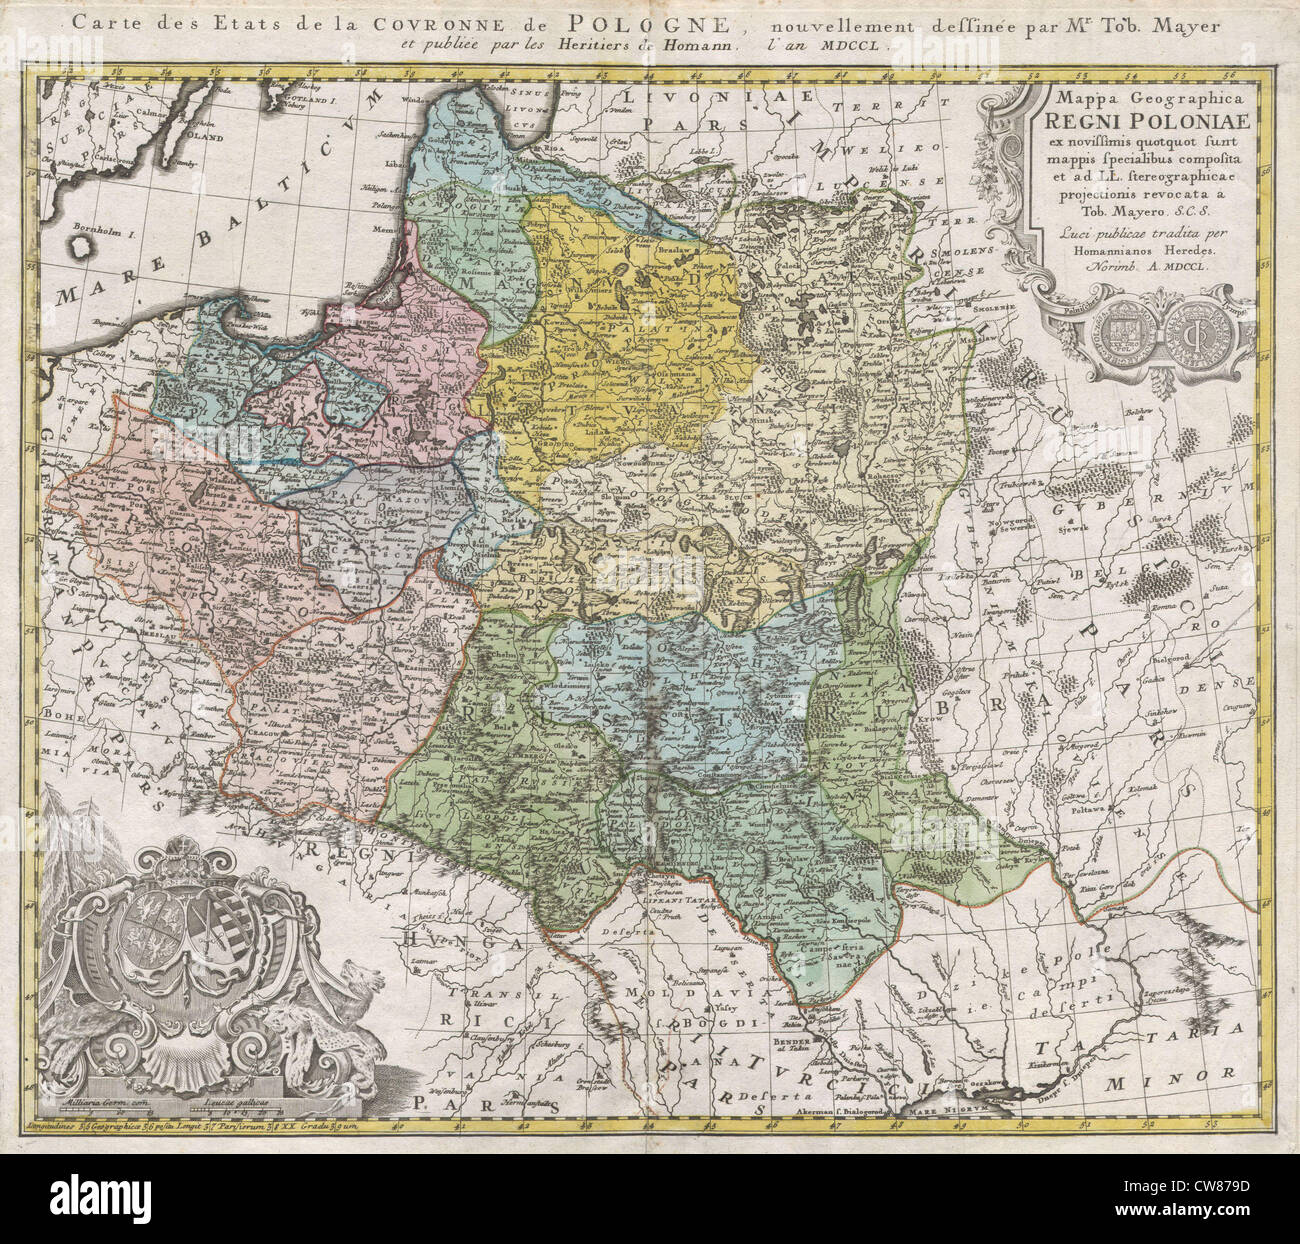 1750 Homann Heirs Map of Poland - Stock Image